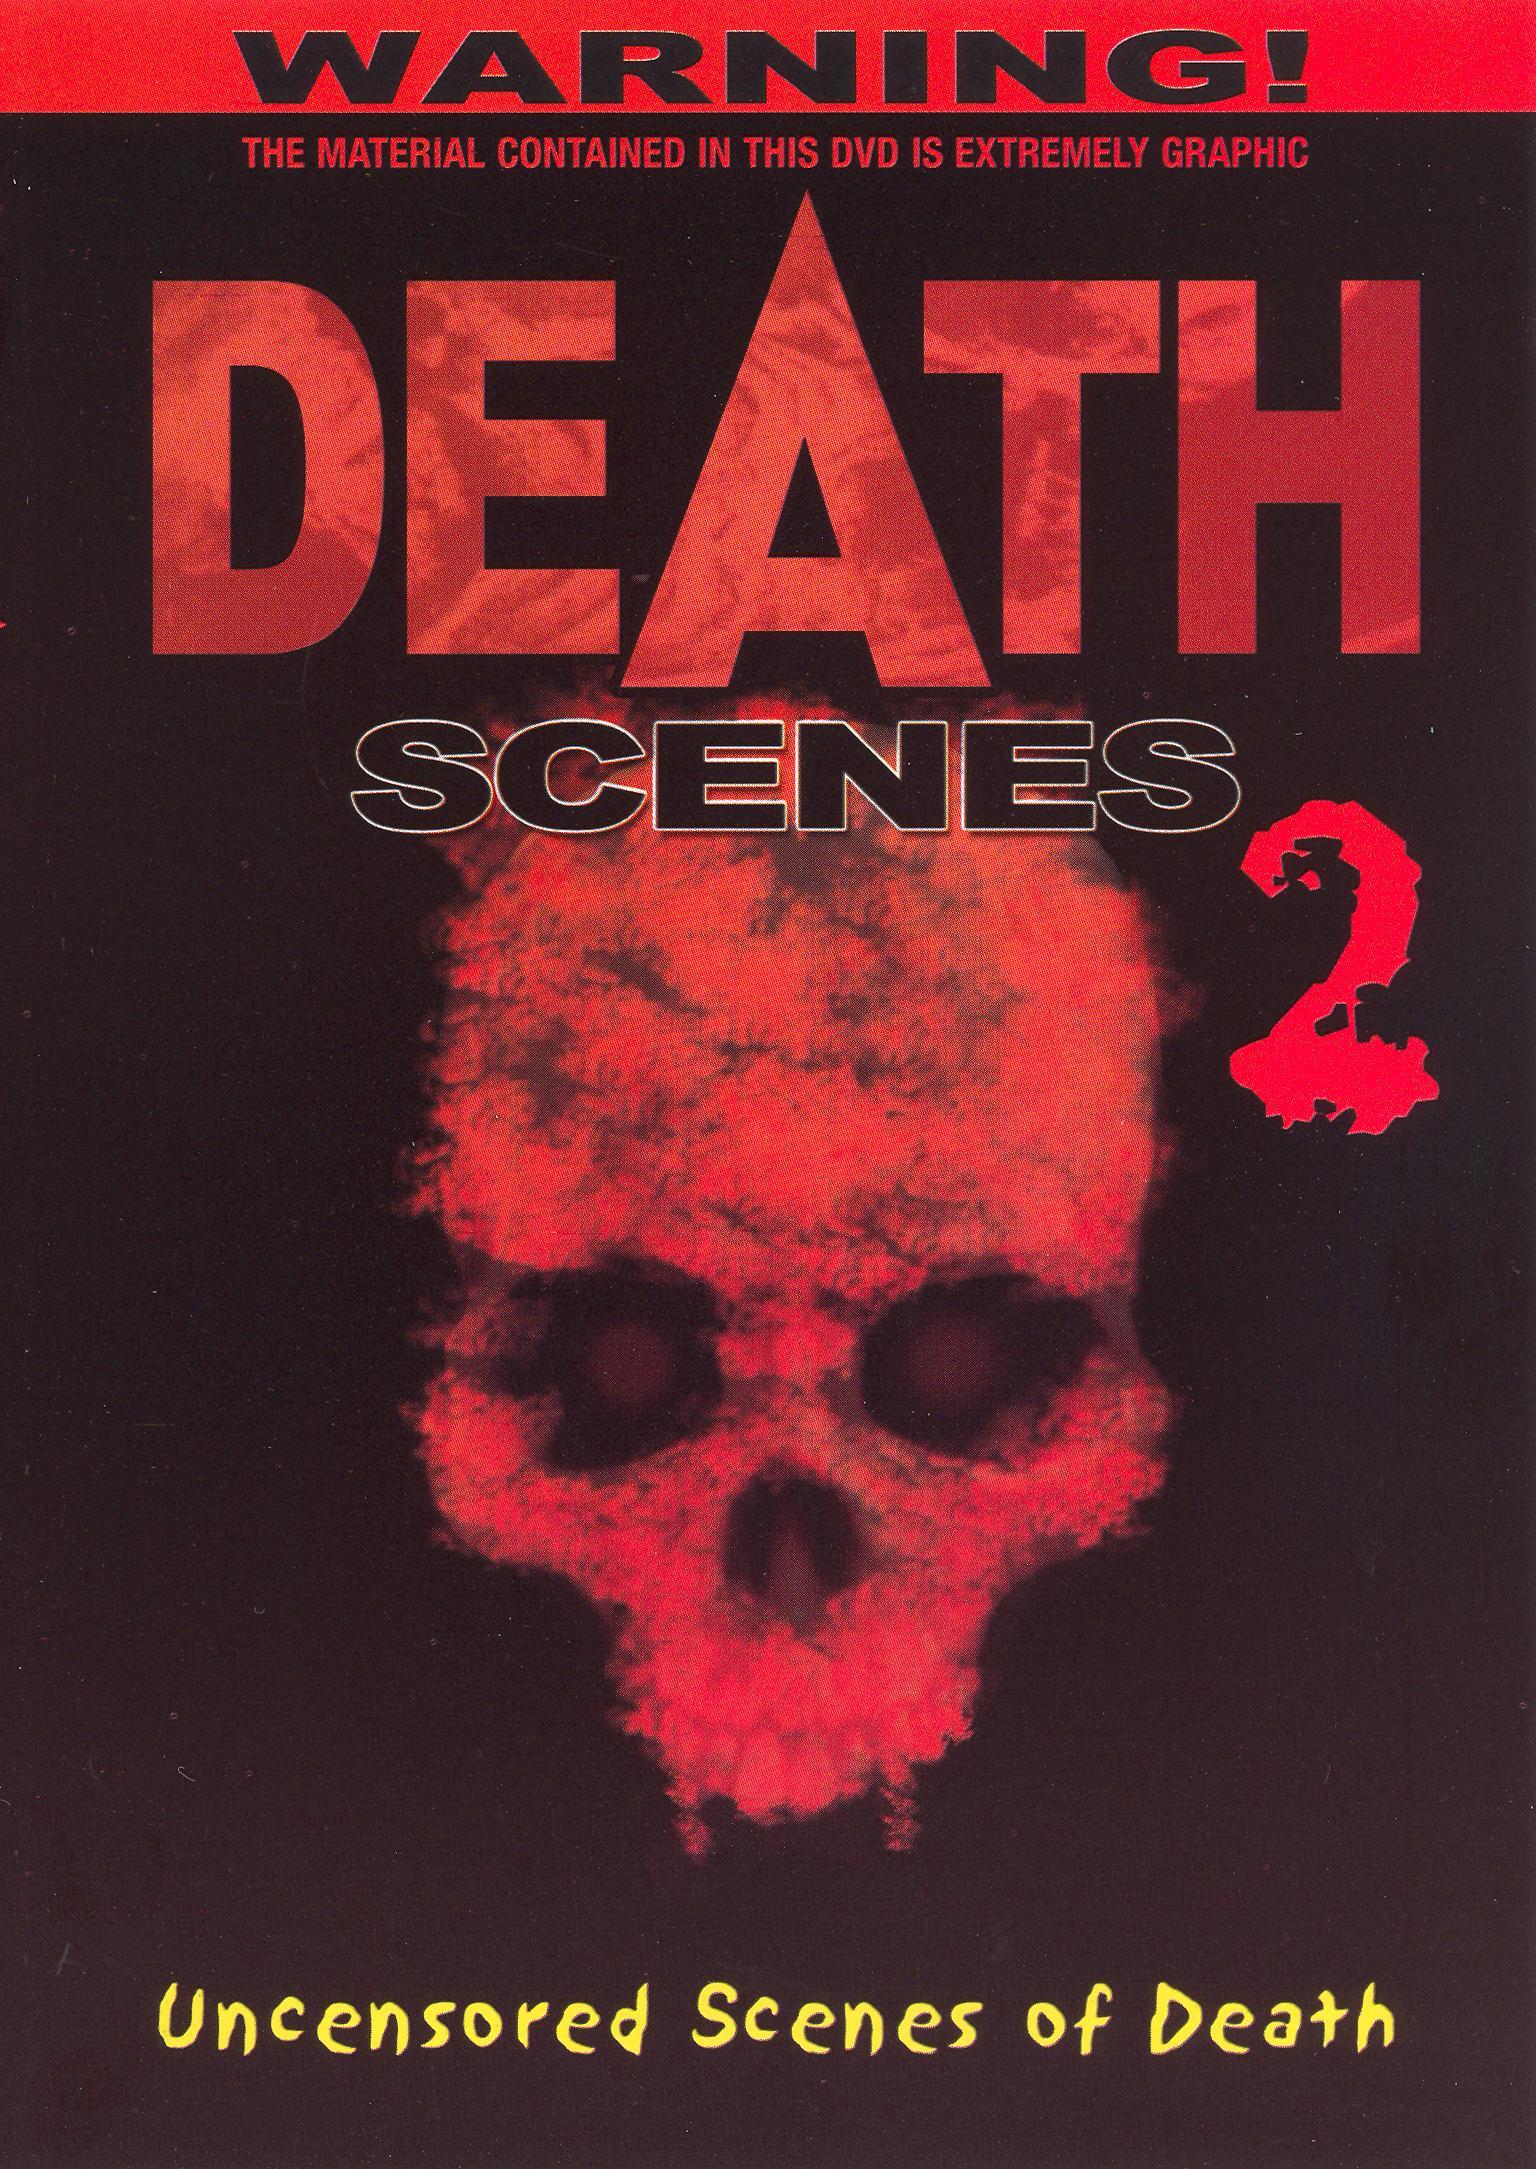 Death Scenes 2